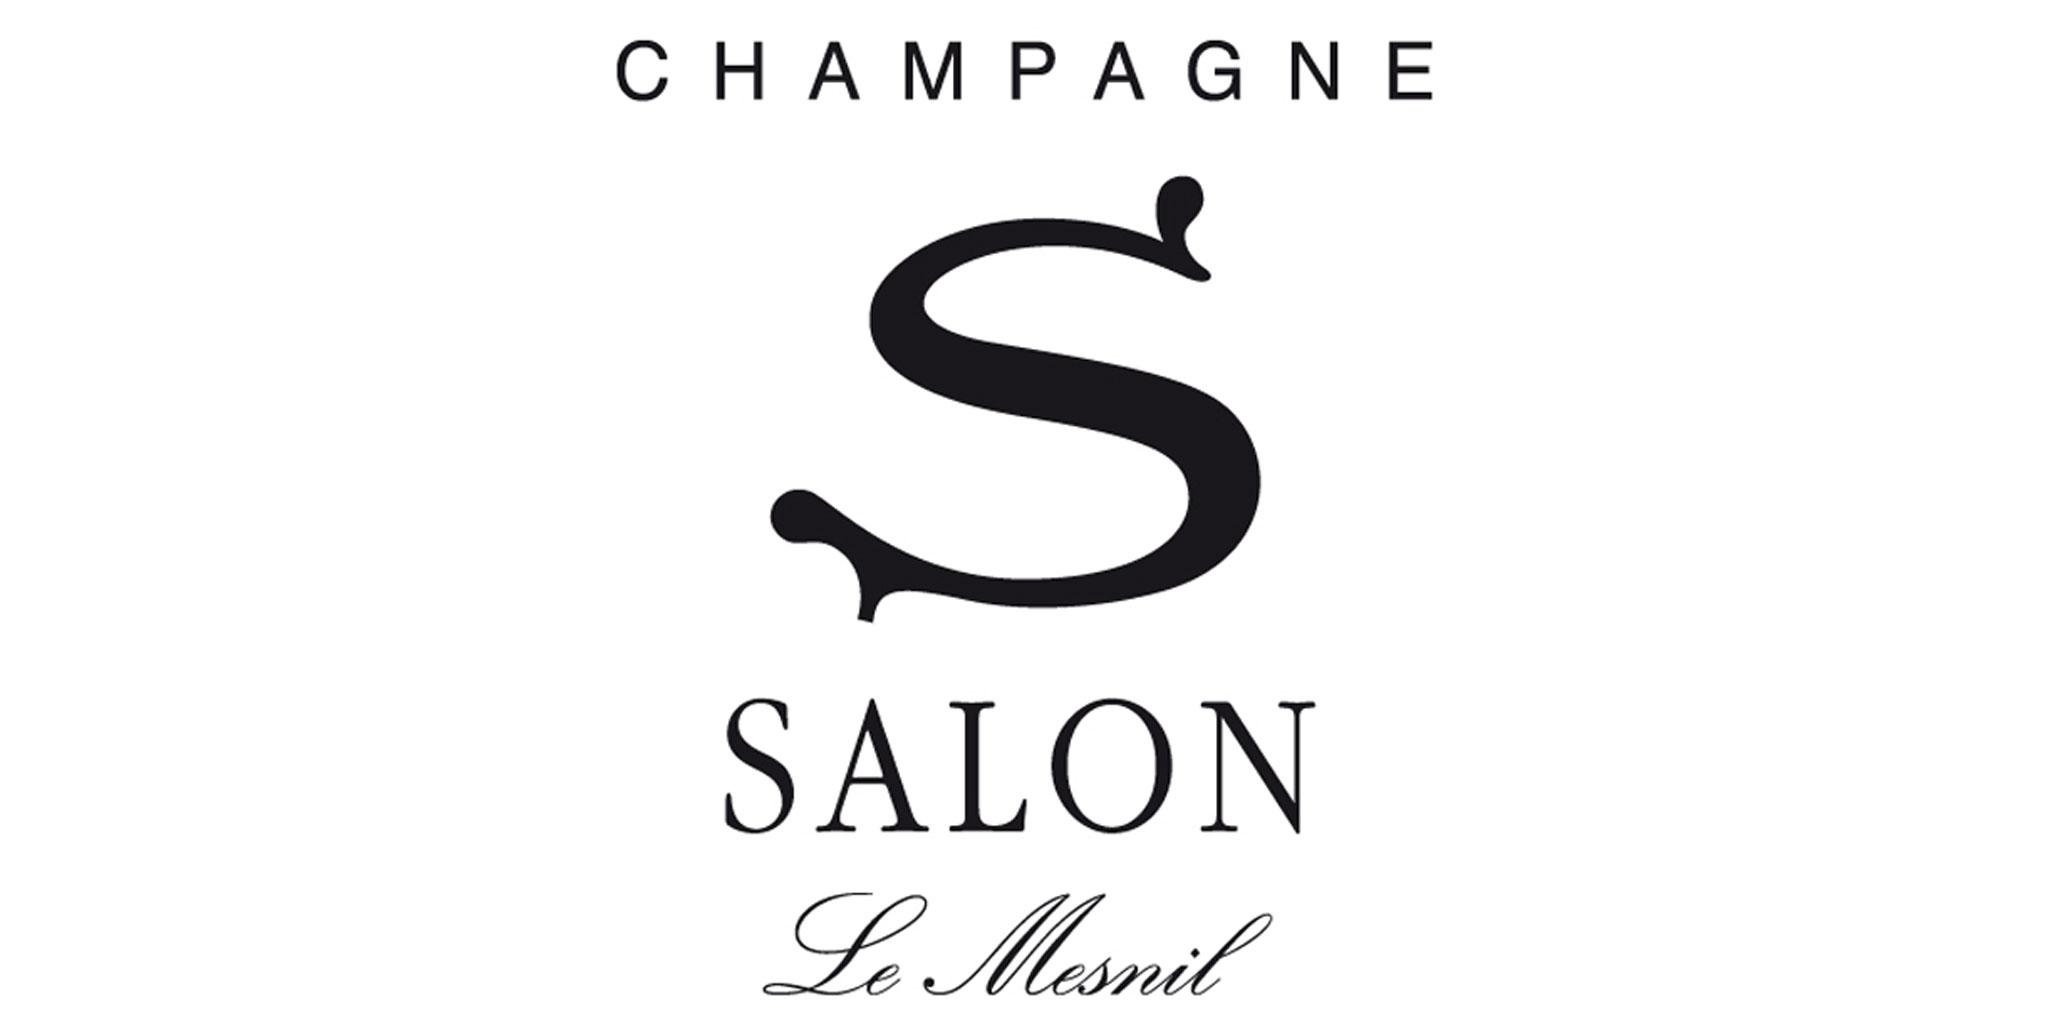 Salon champagne logo